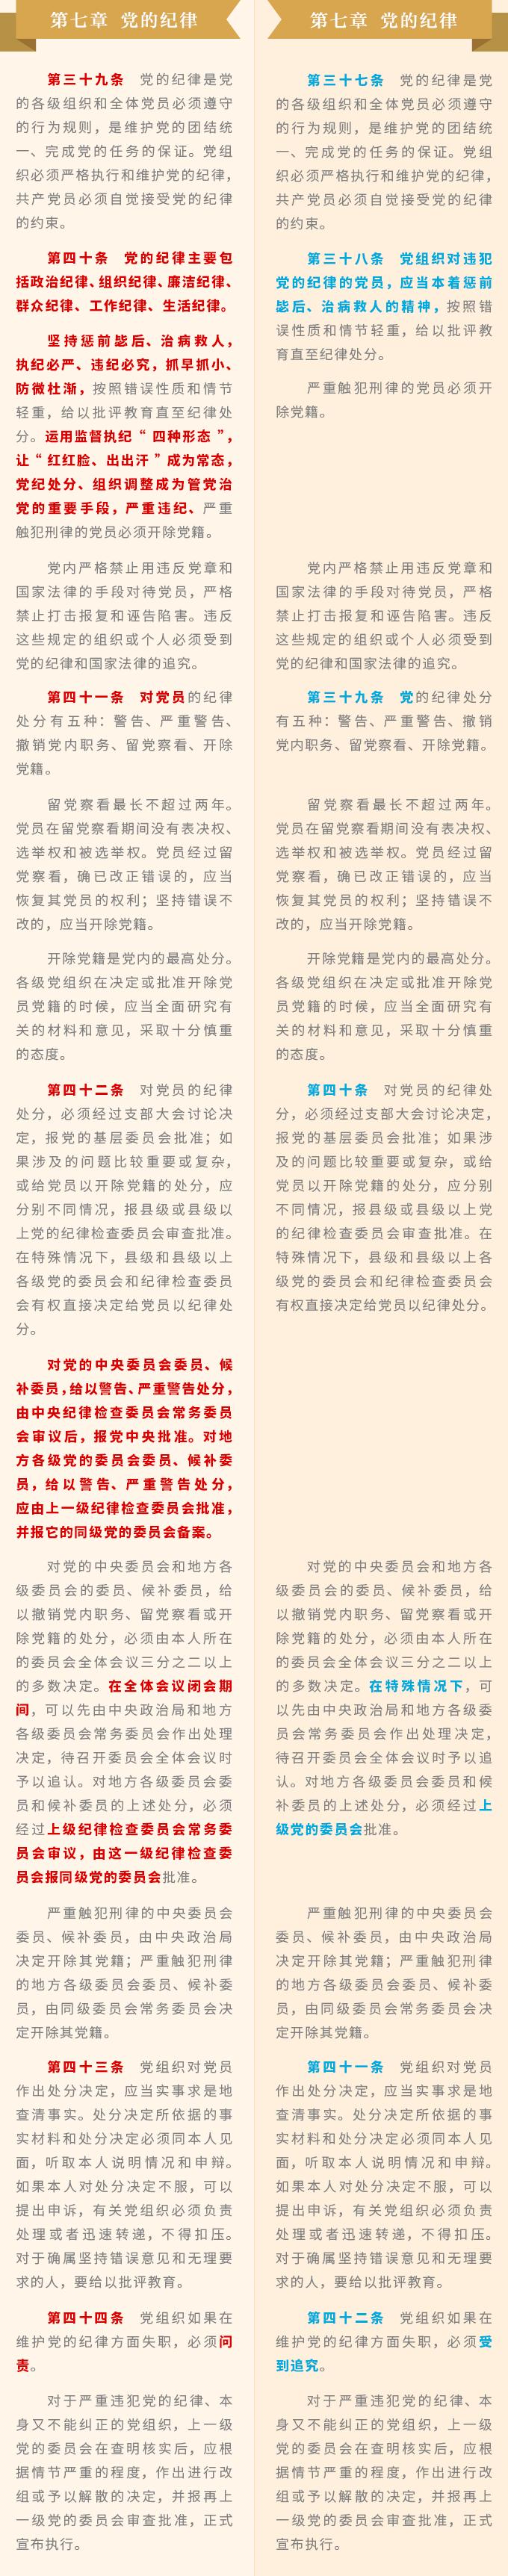 http://www.ccdi.gov.cn/yw/201710/W020171031664658034080.png